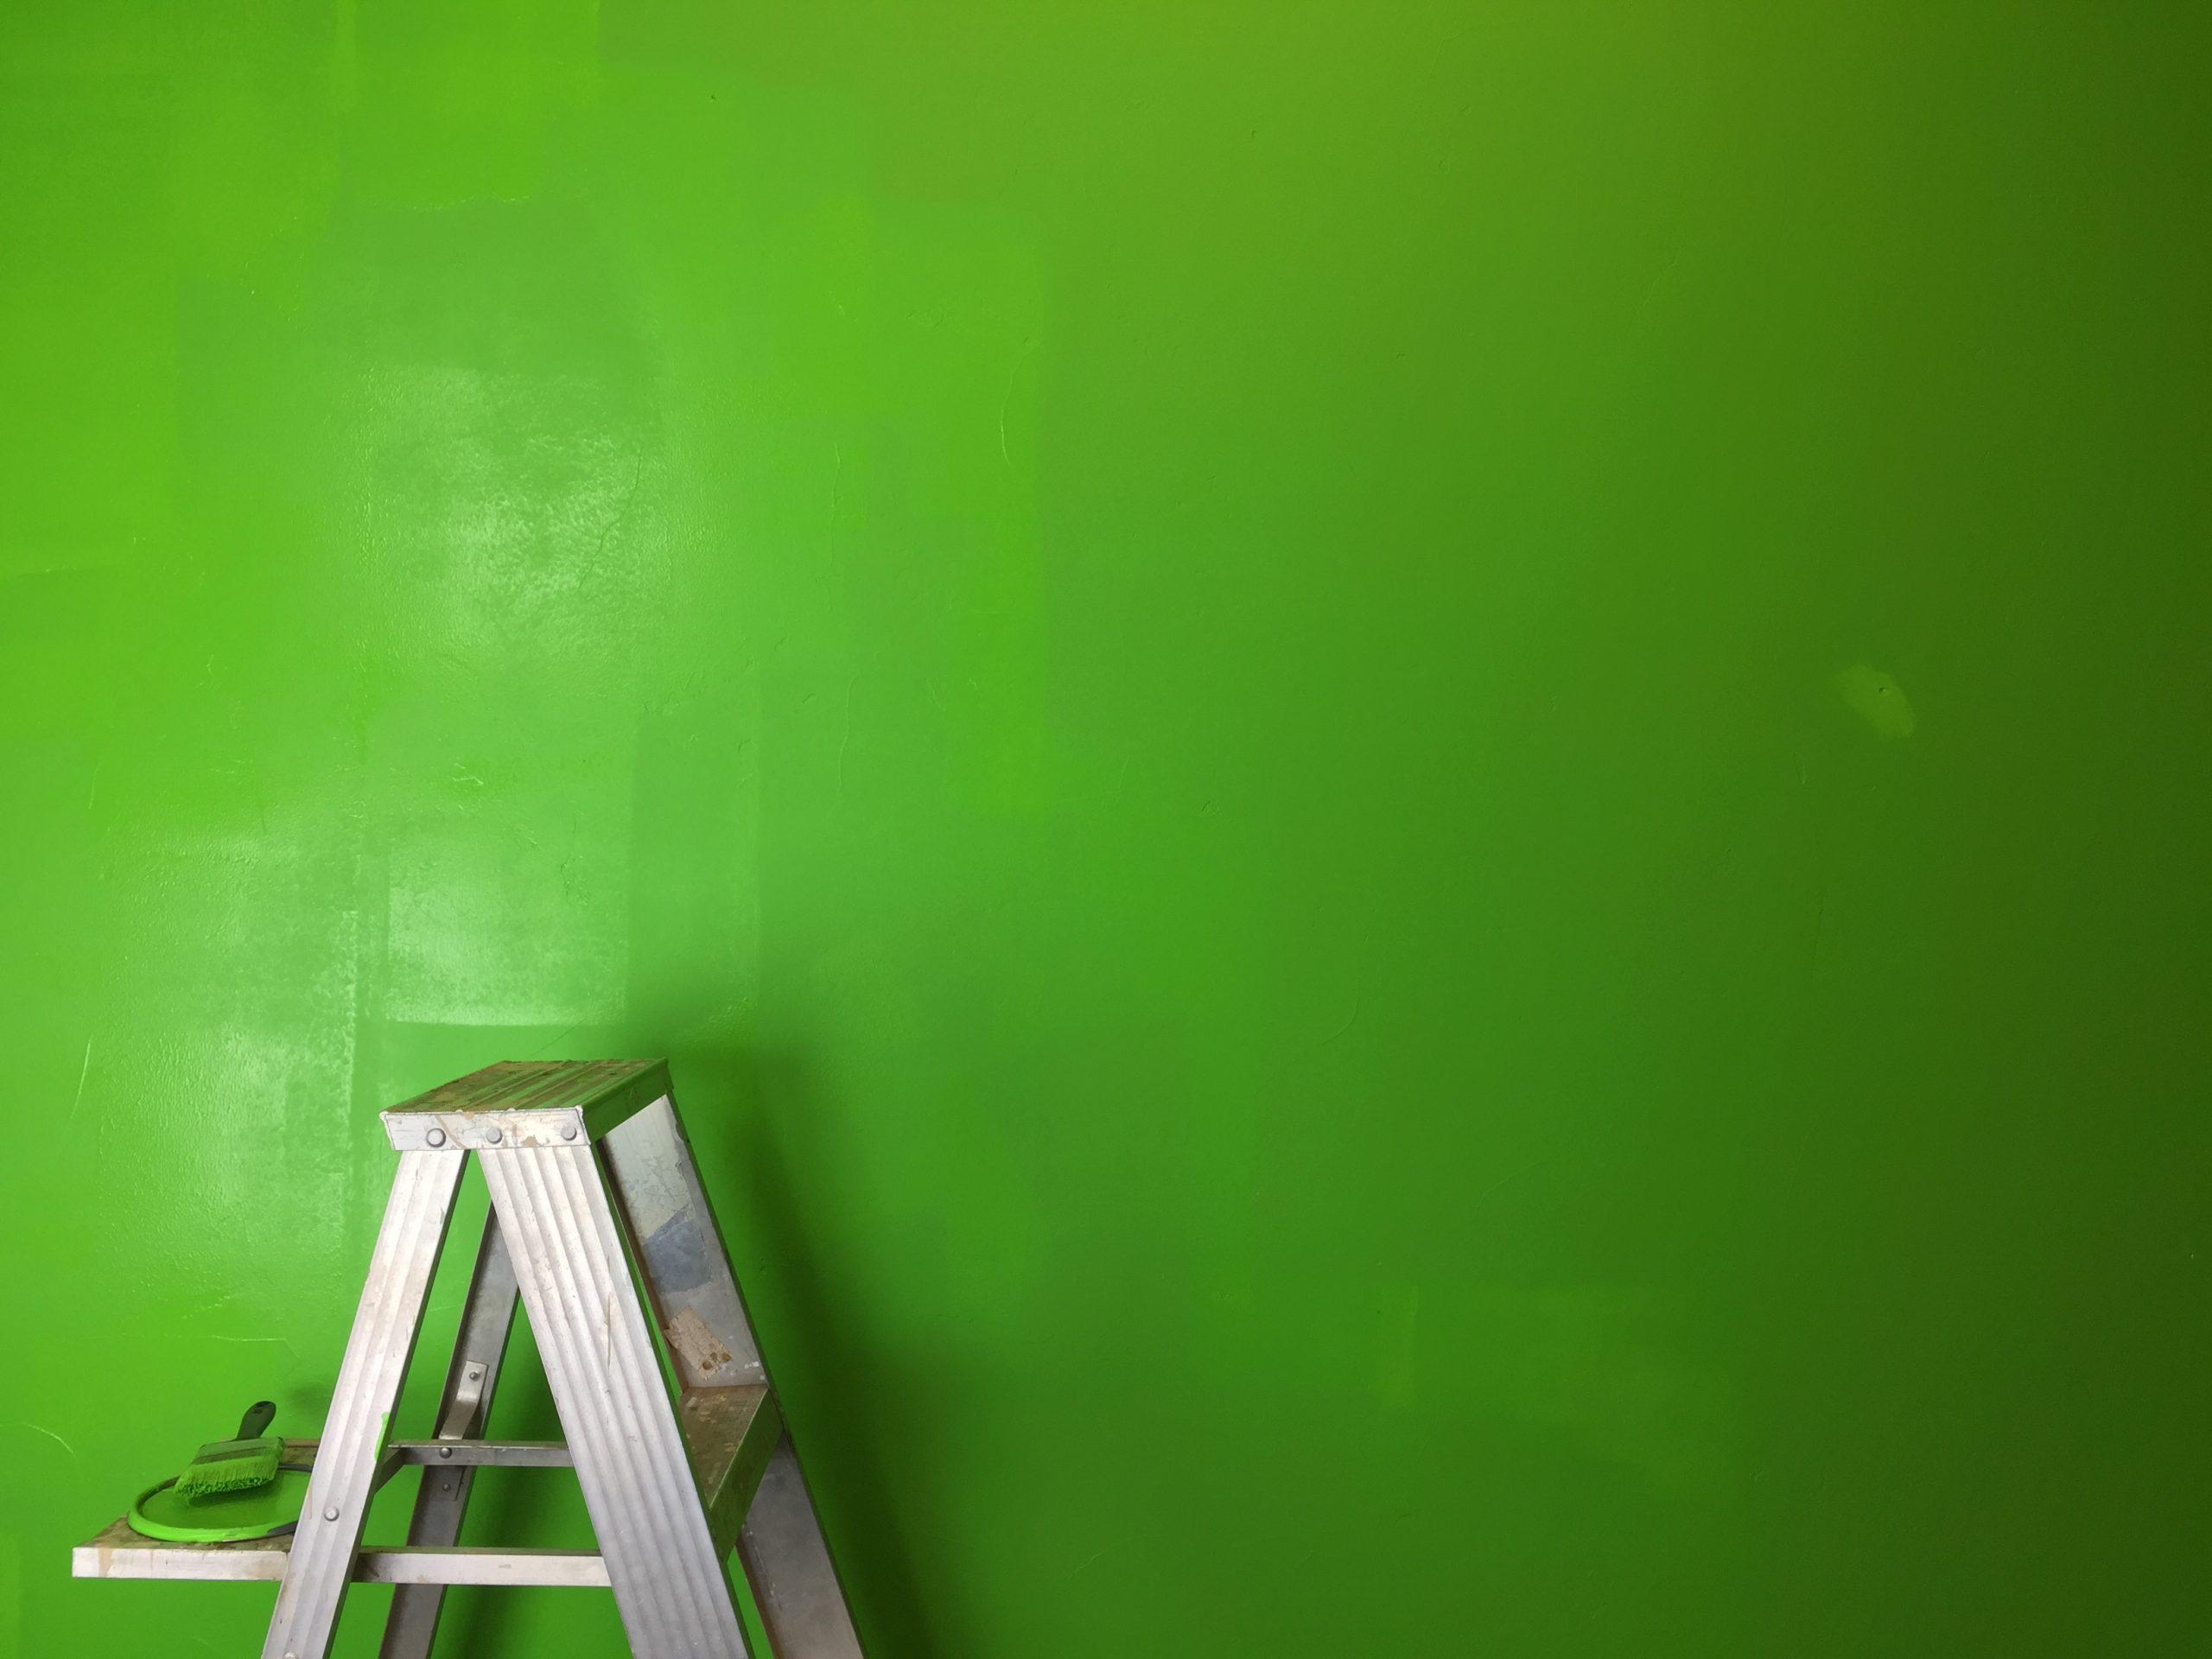 ladder-1977946